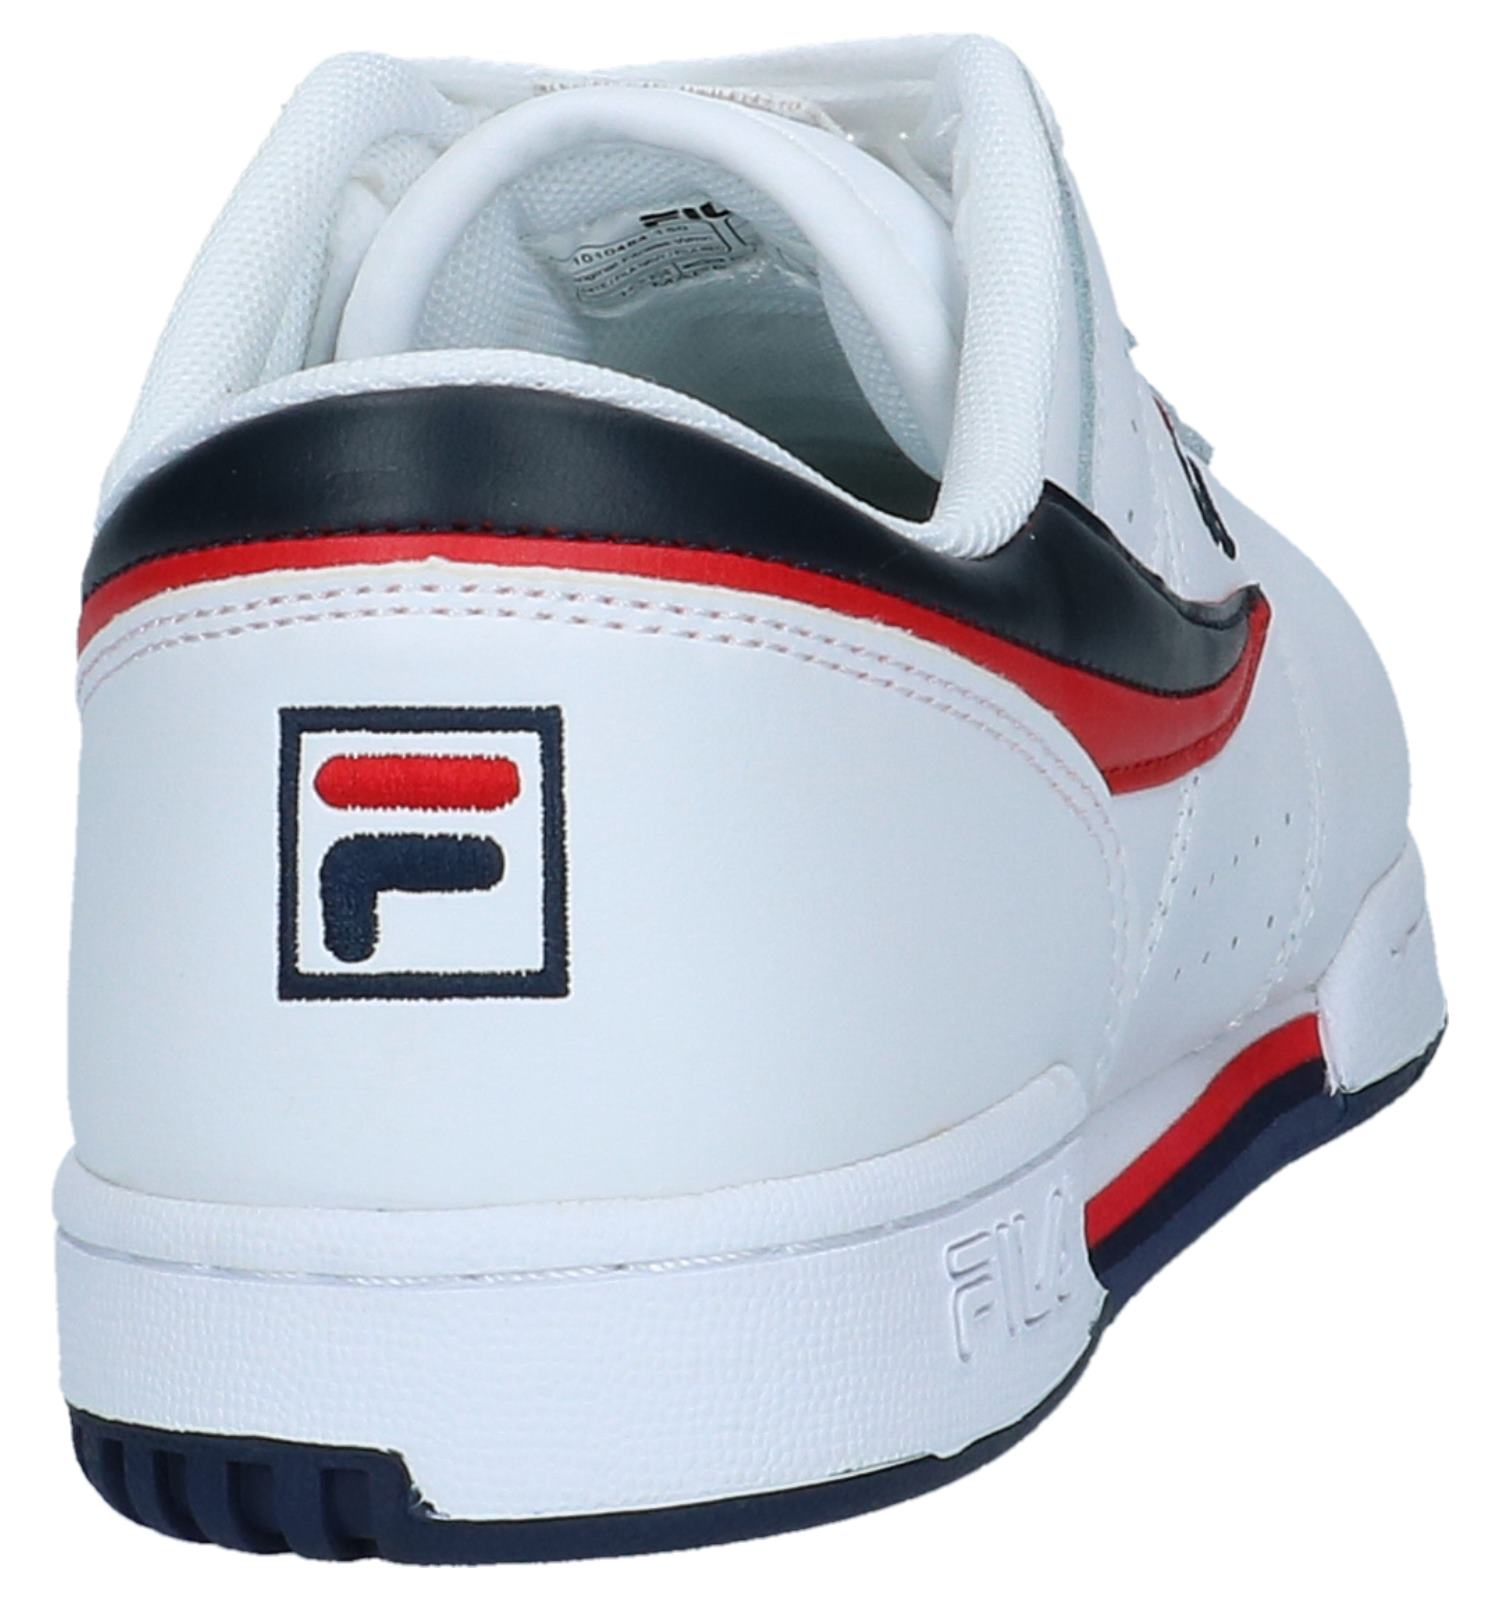 be Basses BlancTorfs Fila Baskets Original Fitness En dBQCthxsro